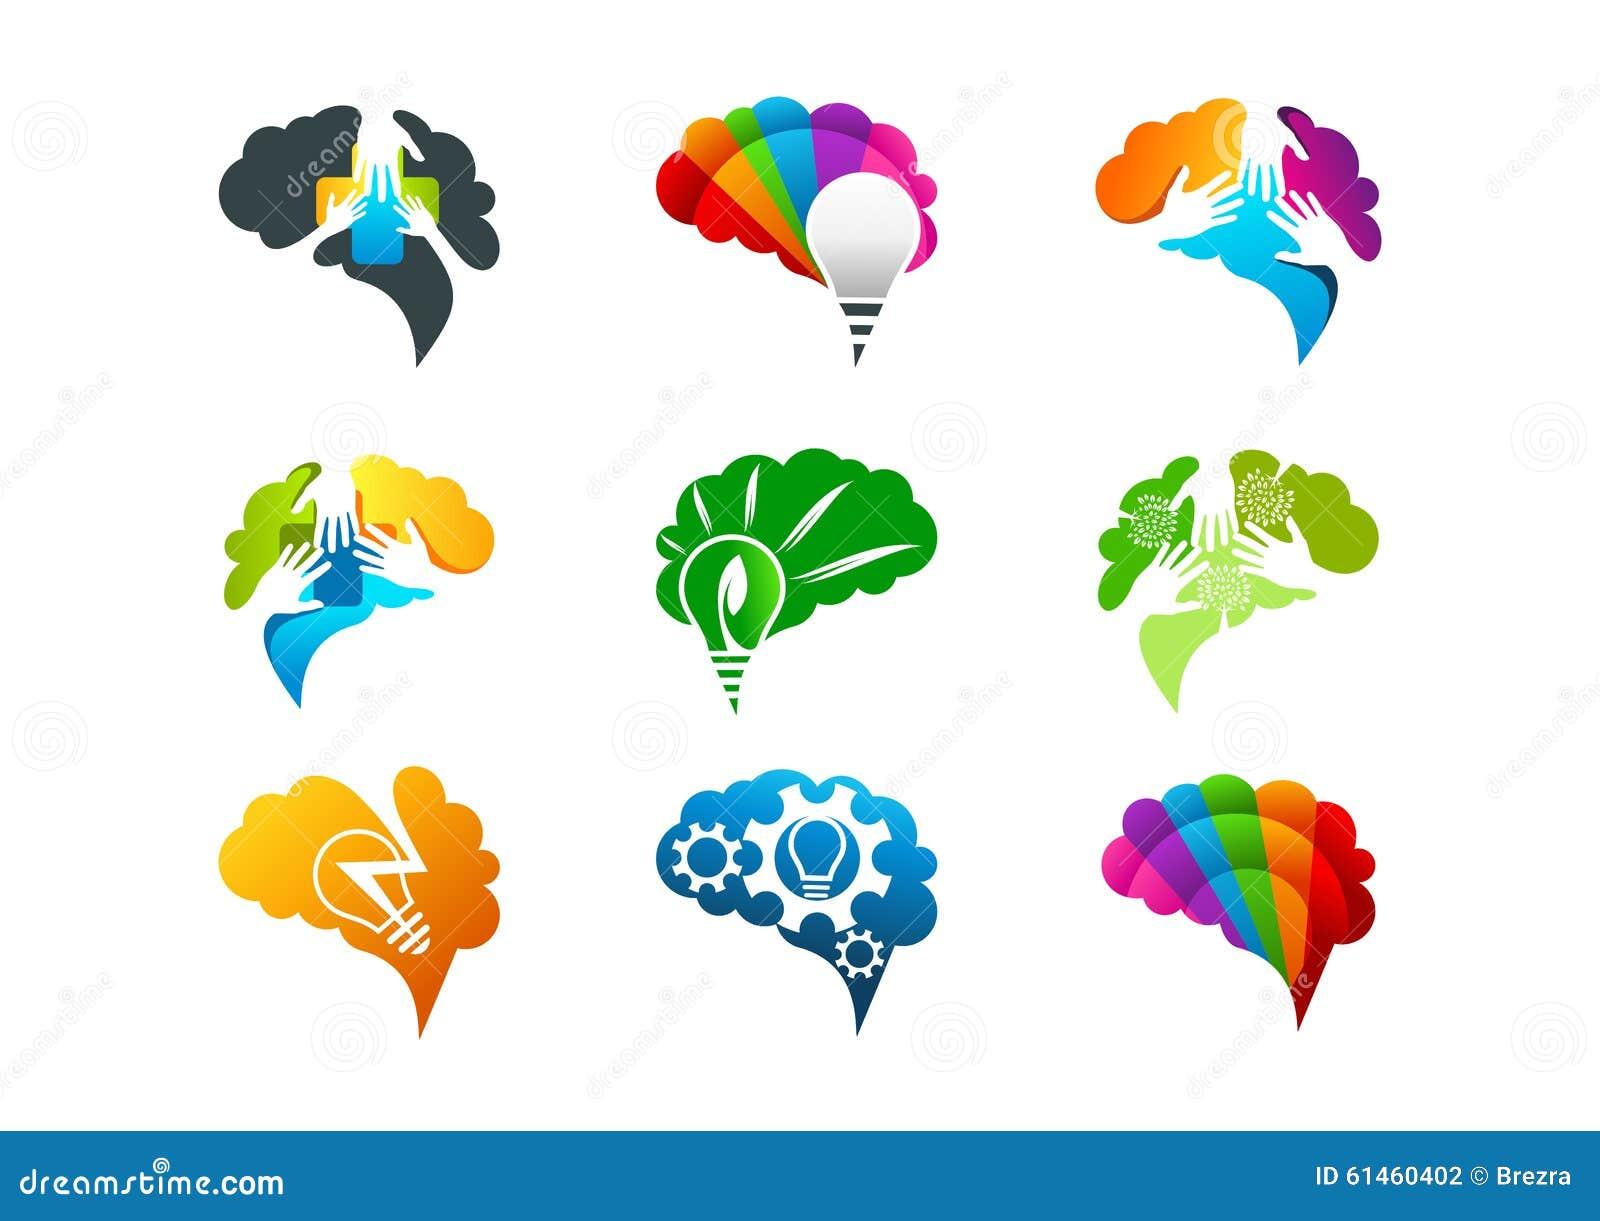 Projeto de conceito do cérebro